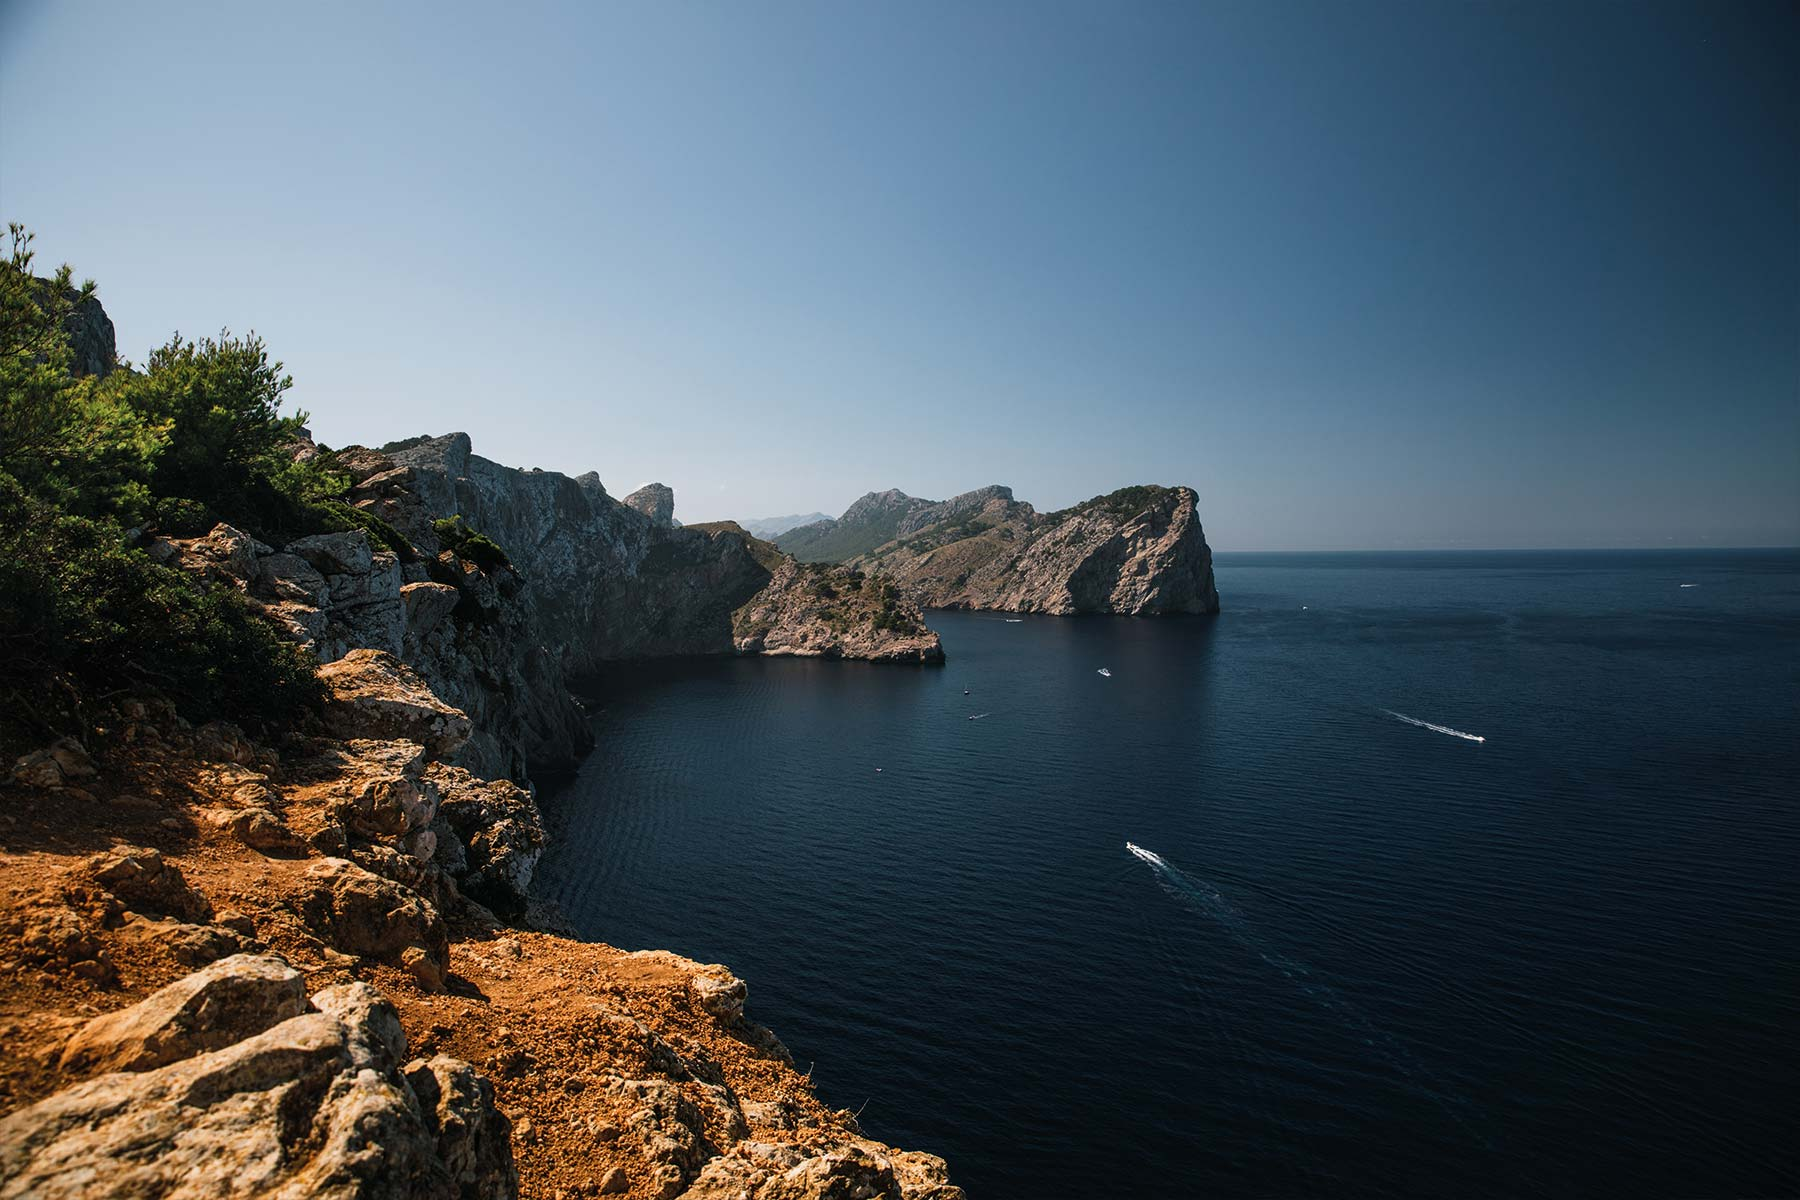 Travel-Photography-Bildreportage-Mallorca-Spain-Vacation-Basti-Kaspar_bucht-steilhang